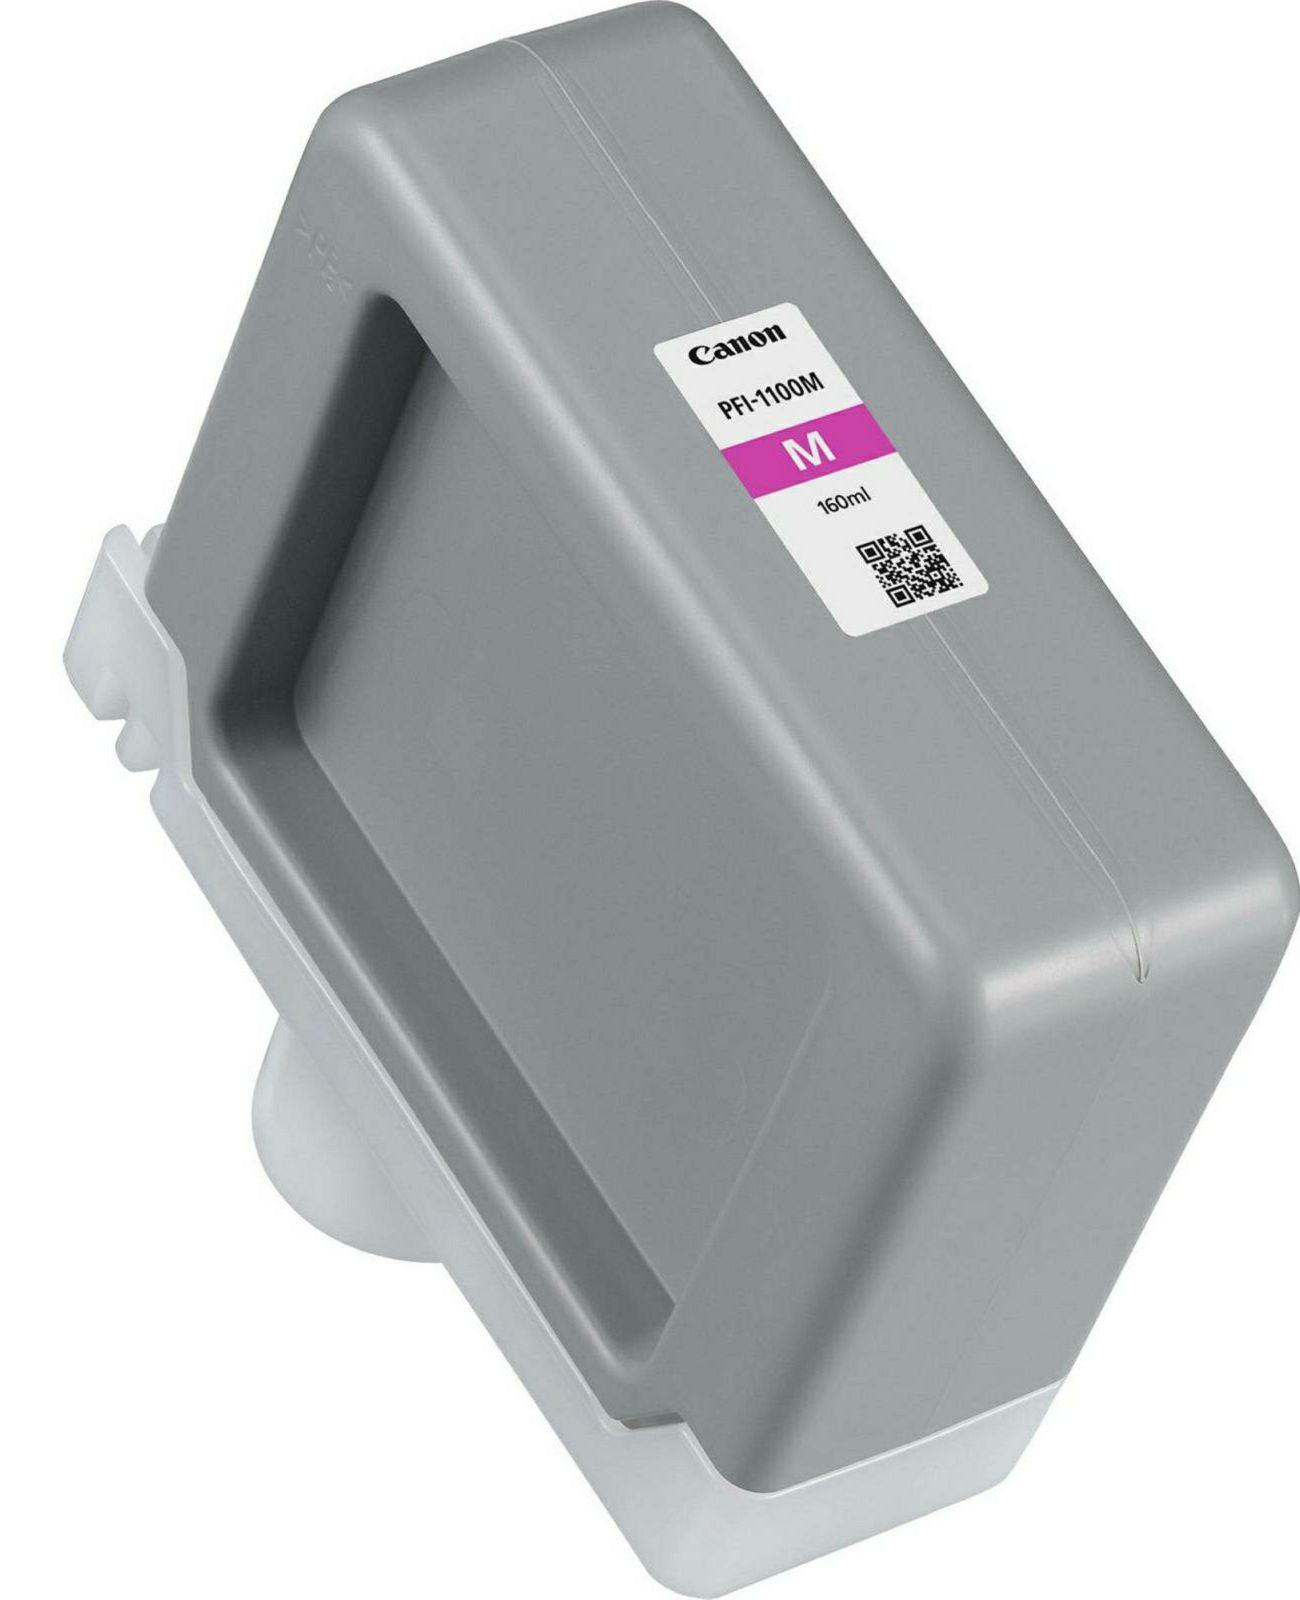 Canon Pigment Ink Tank PFI-1100 Magenta 160ml PFI1100M purpurnocrvena tinta za ploter imagePROGRAF PRO-2000, PRO-4000, PRO-4000S, PRO-6000, PRO-6000S Large-Format Printers (0852C001AA)